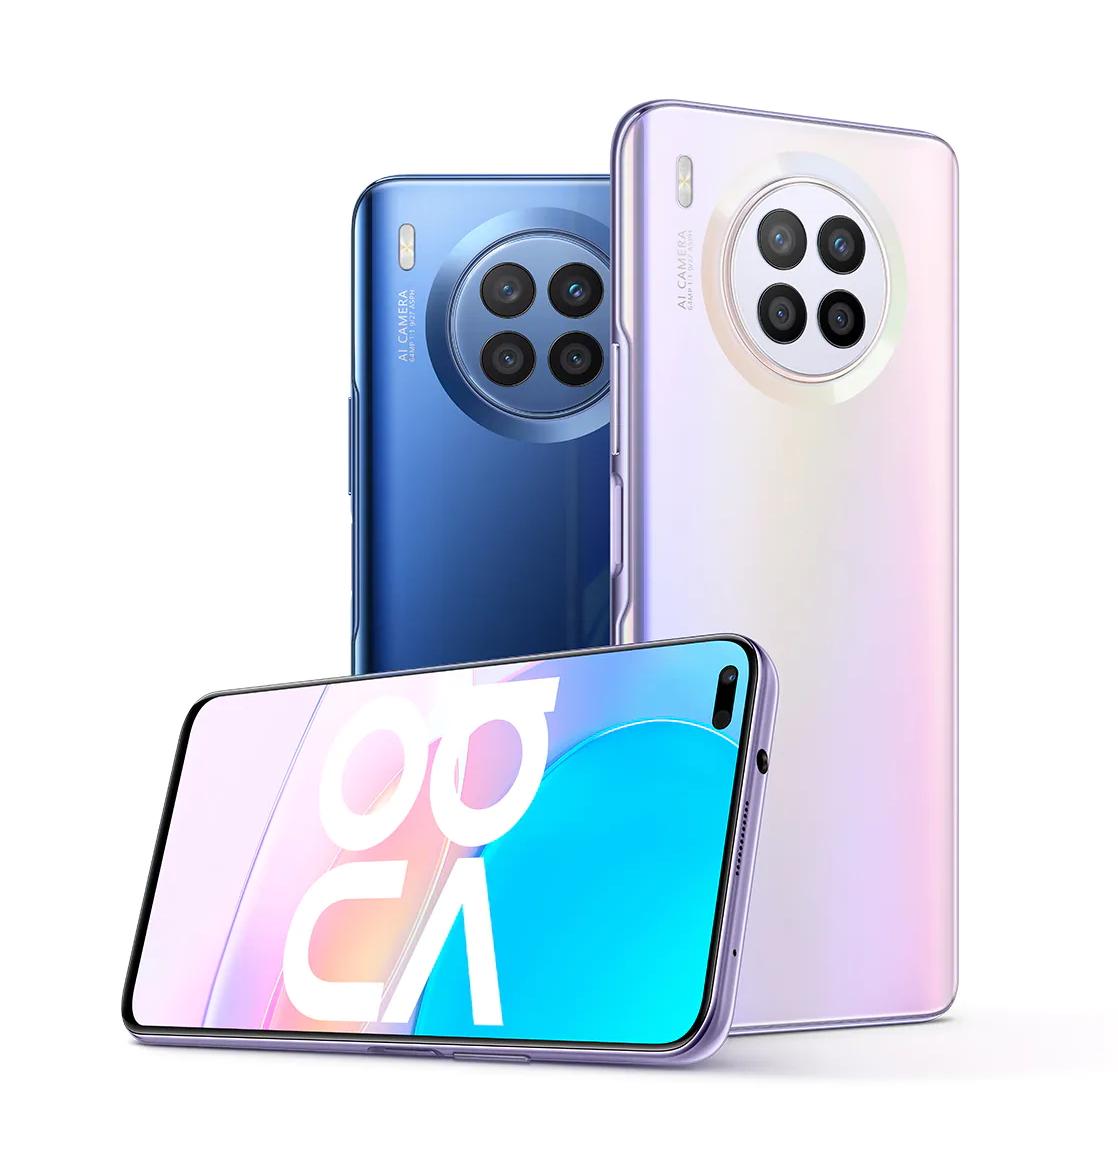 Huawei still wants a piece of the European smartphone market